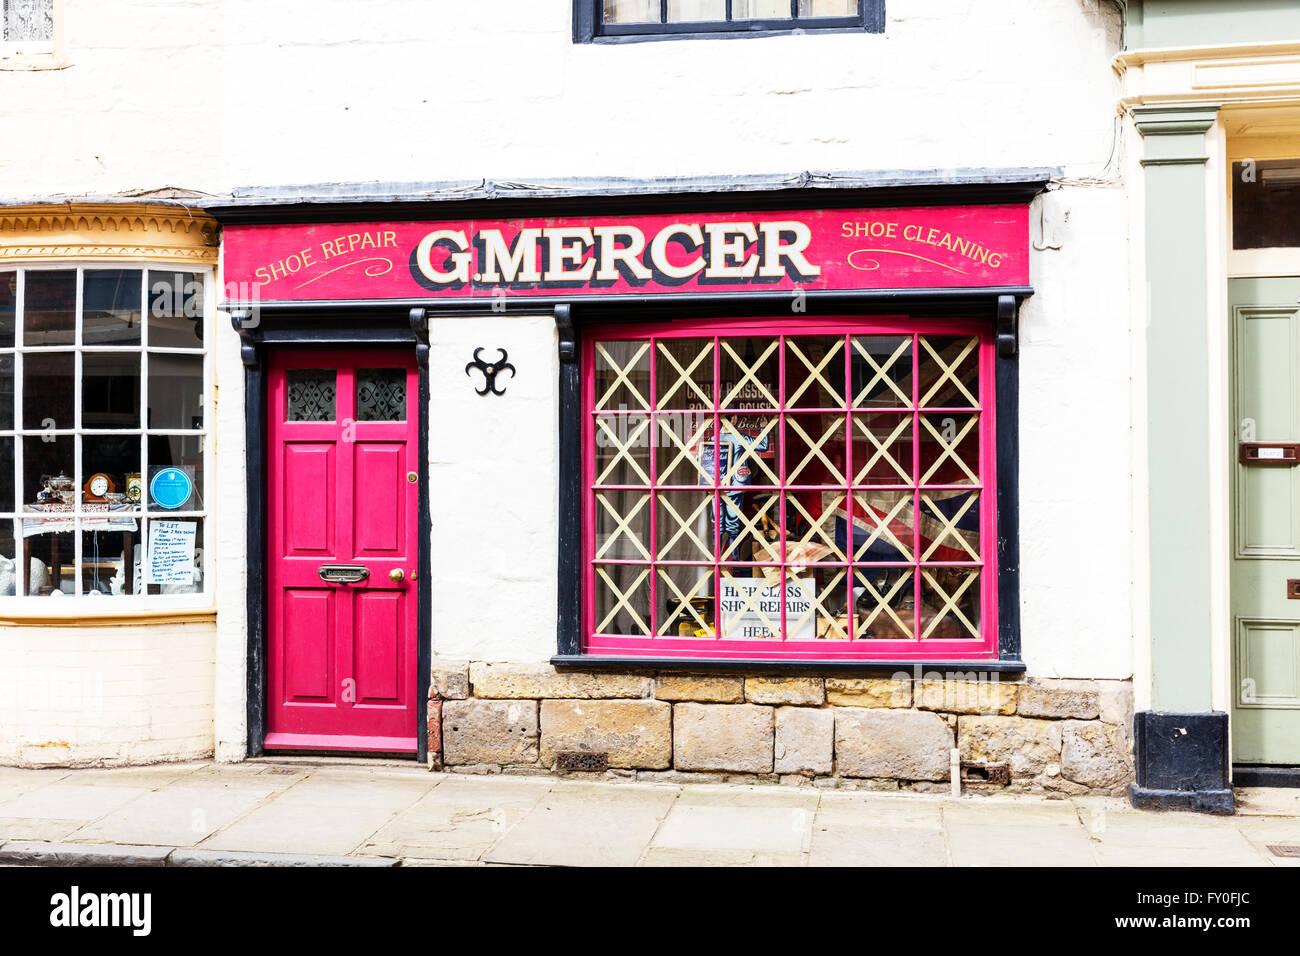 Bridlington old town shops shop dads army decor blitz tape on windows Yorkshire UK England coastal town towns - Stock Image